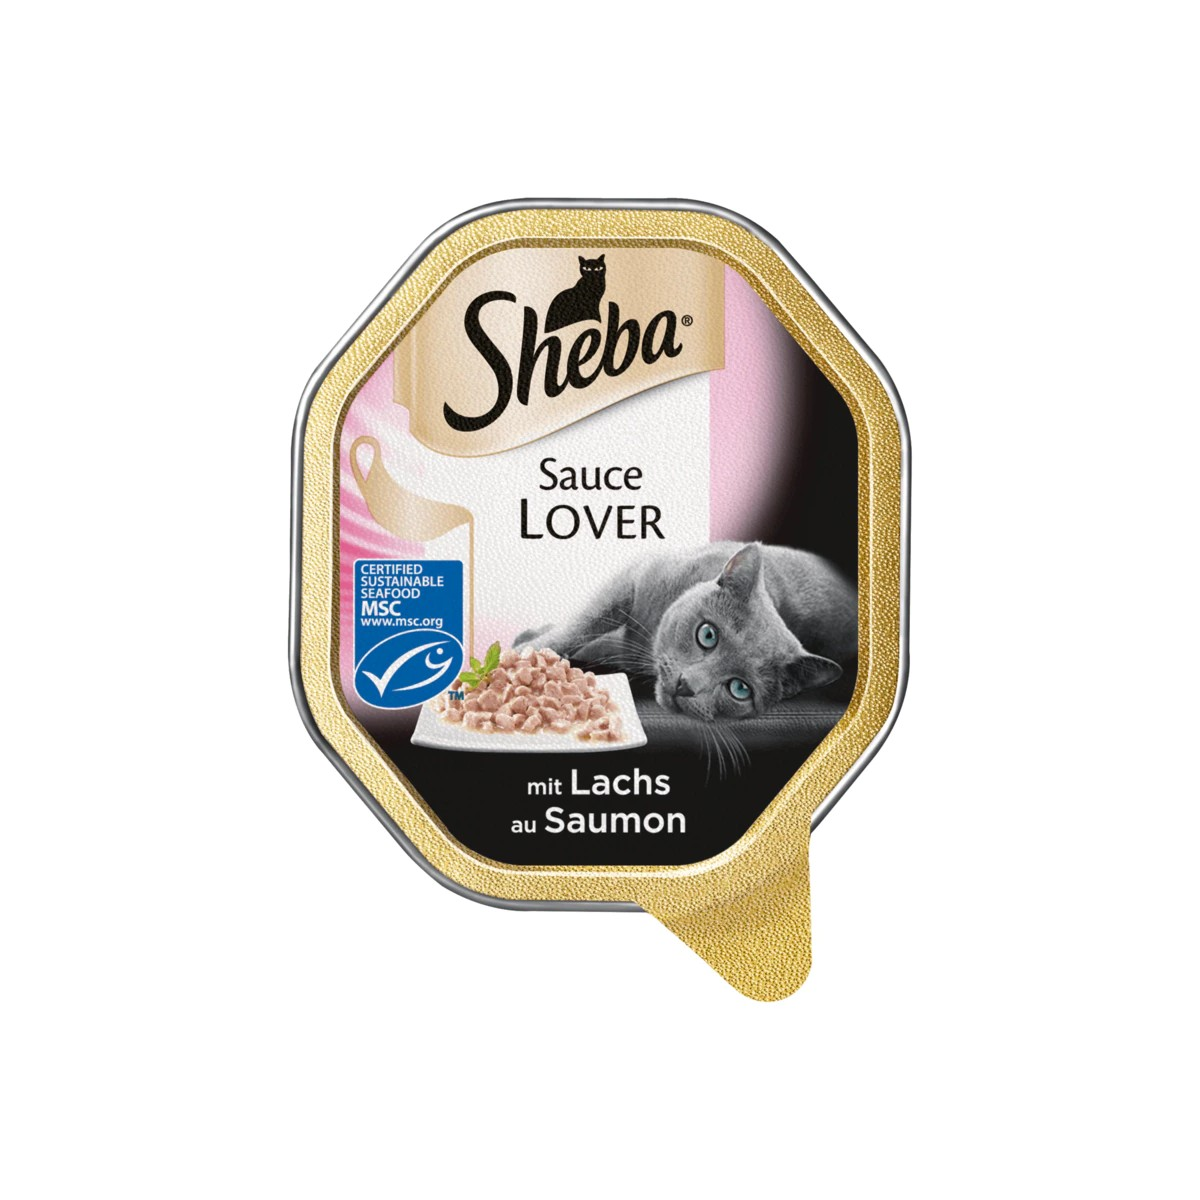 Sheba Sauce Lover mit Lachs